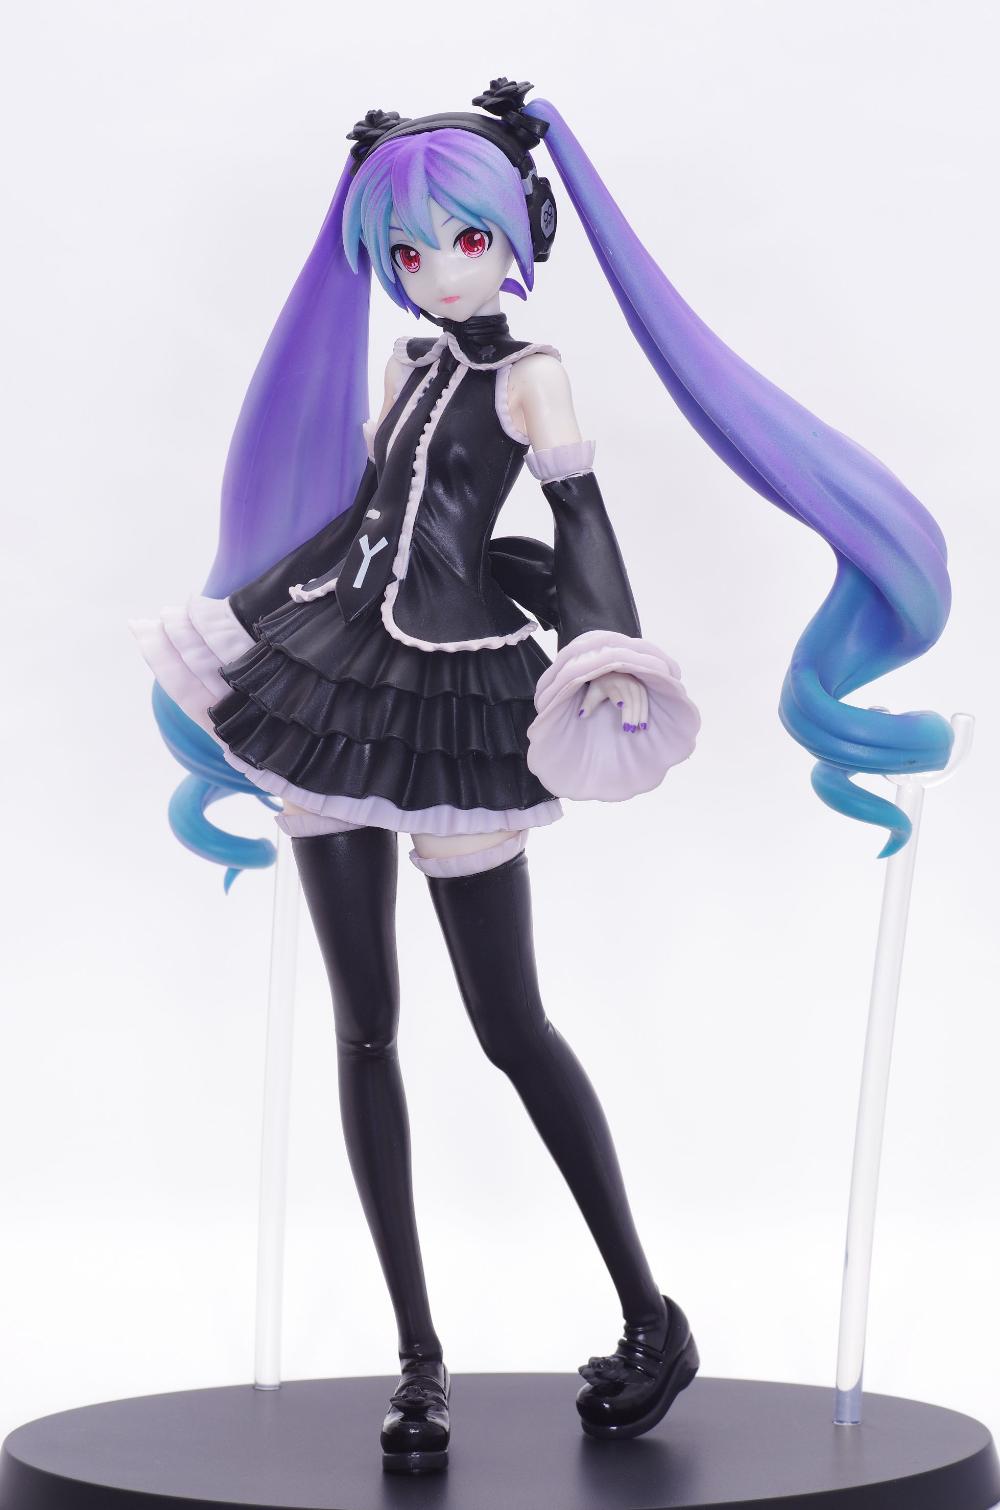 Vocaloid Hatsune Miku Figure Future Animetal Anime Figures Uk Hatsune Miku Hatsune Miku